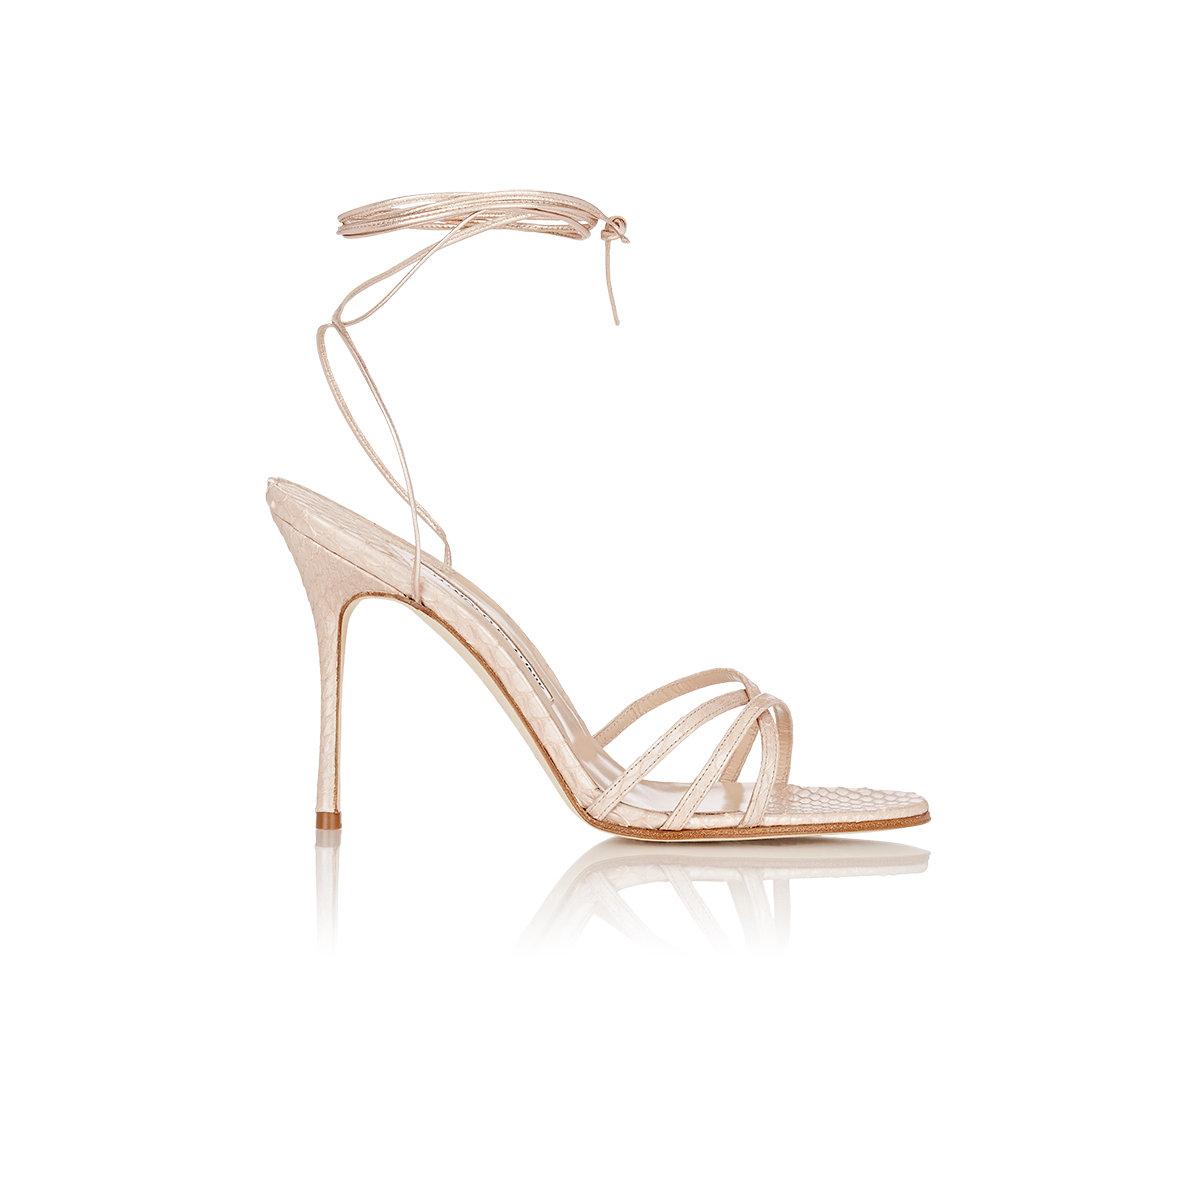 aaa3673c11d3d Manolo Blahnik Women's Snakeskin Leva Ankle-wrap Sandals in Natural ...